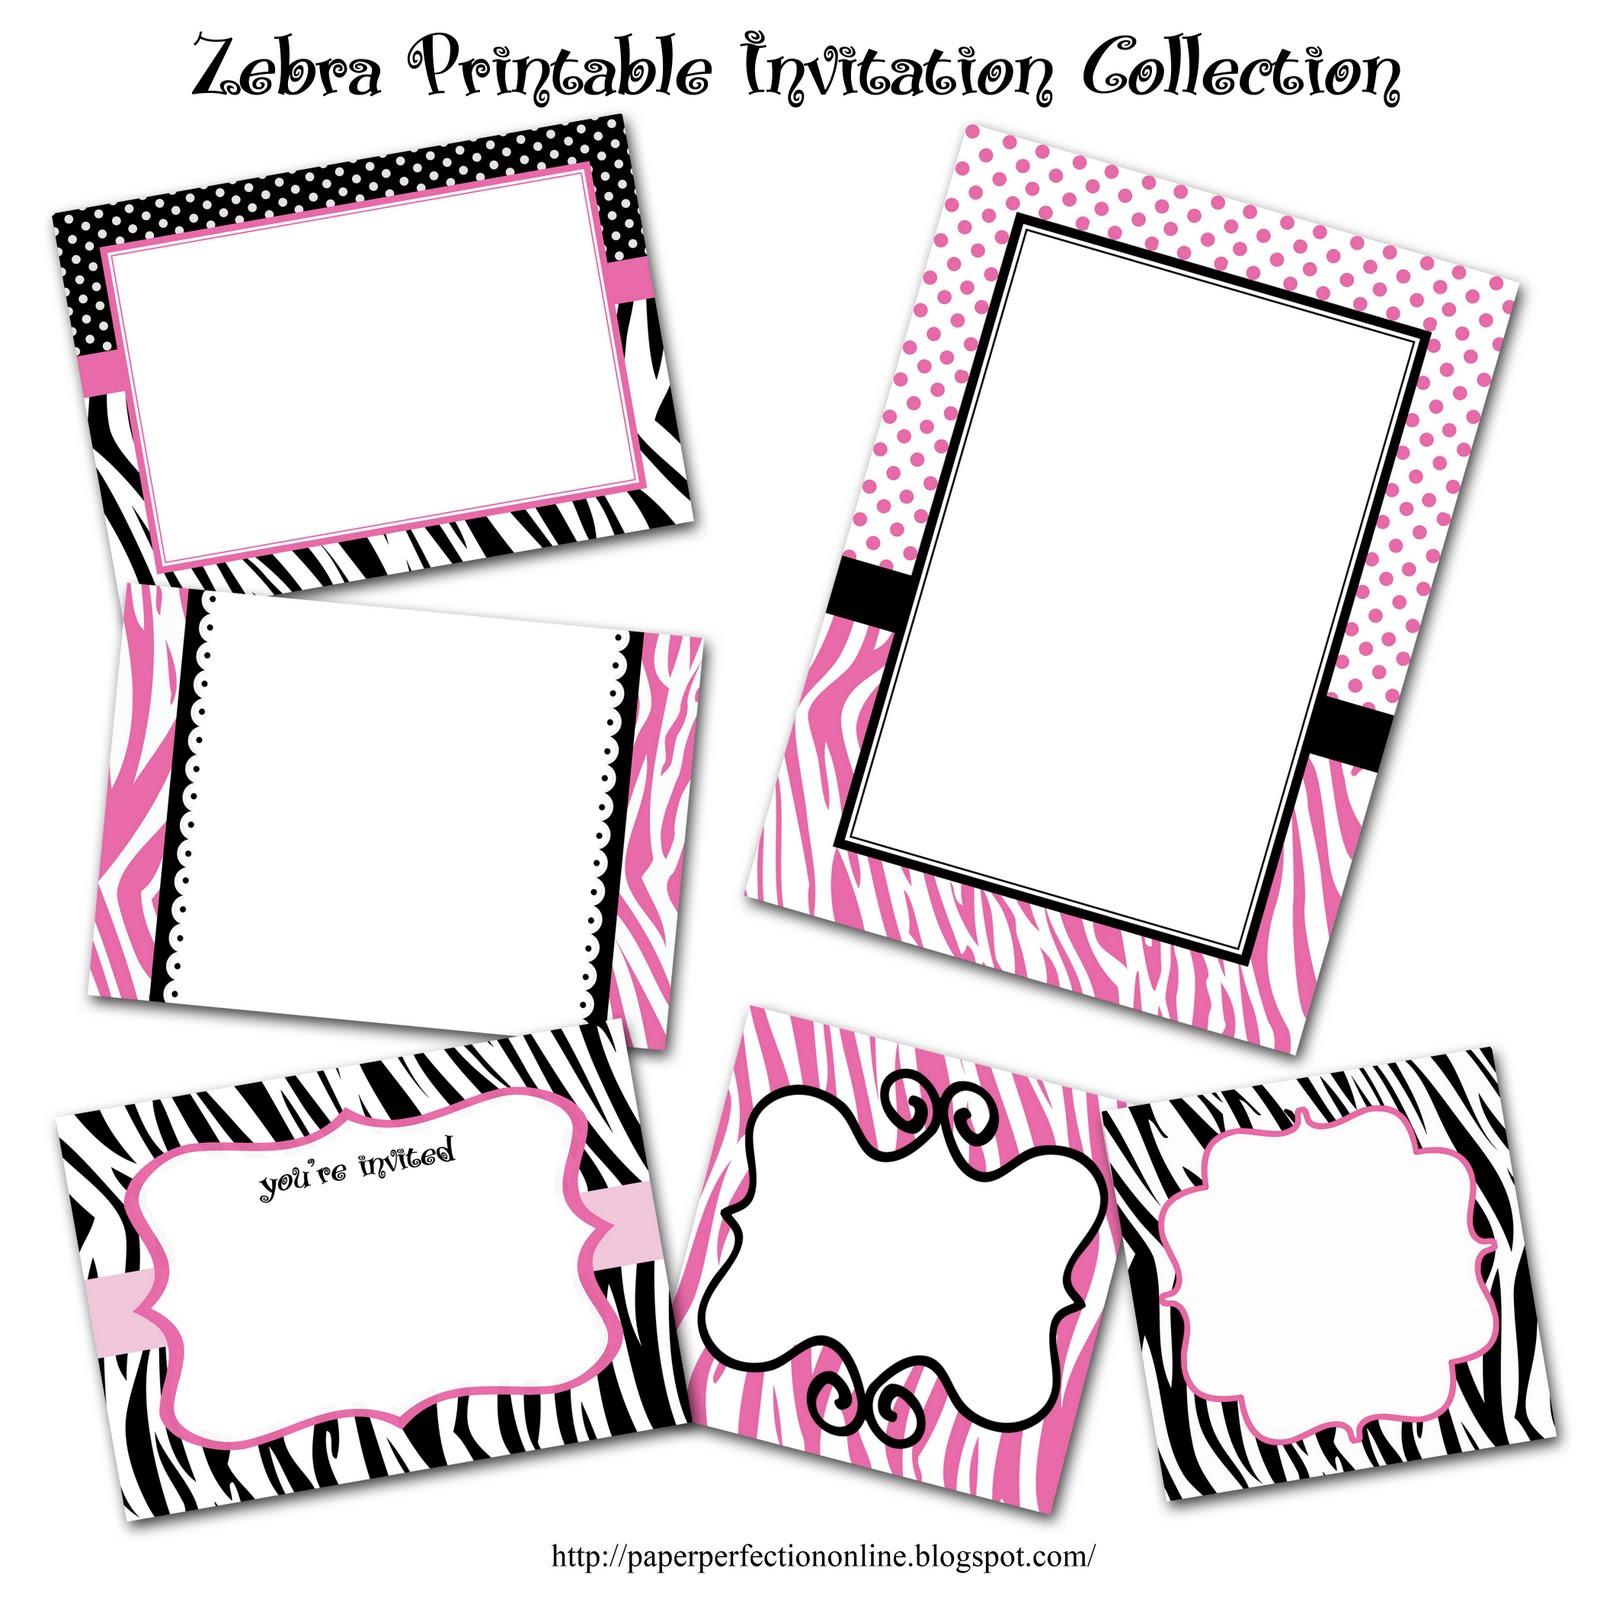 Zebra Print Border Template Zebra Print Border Template